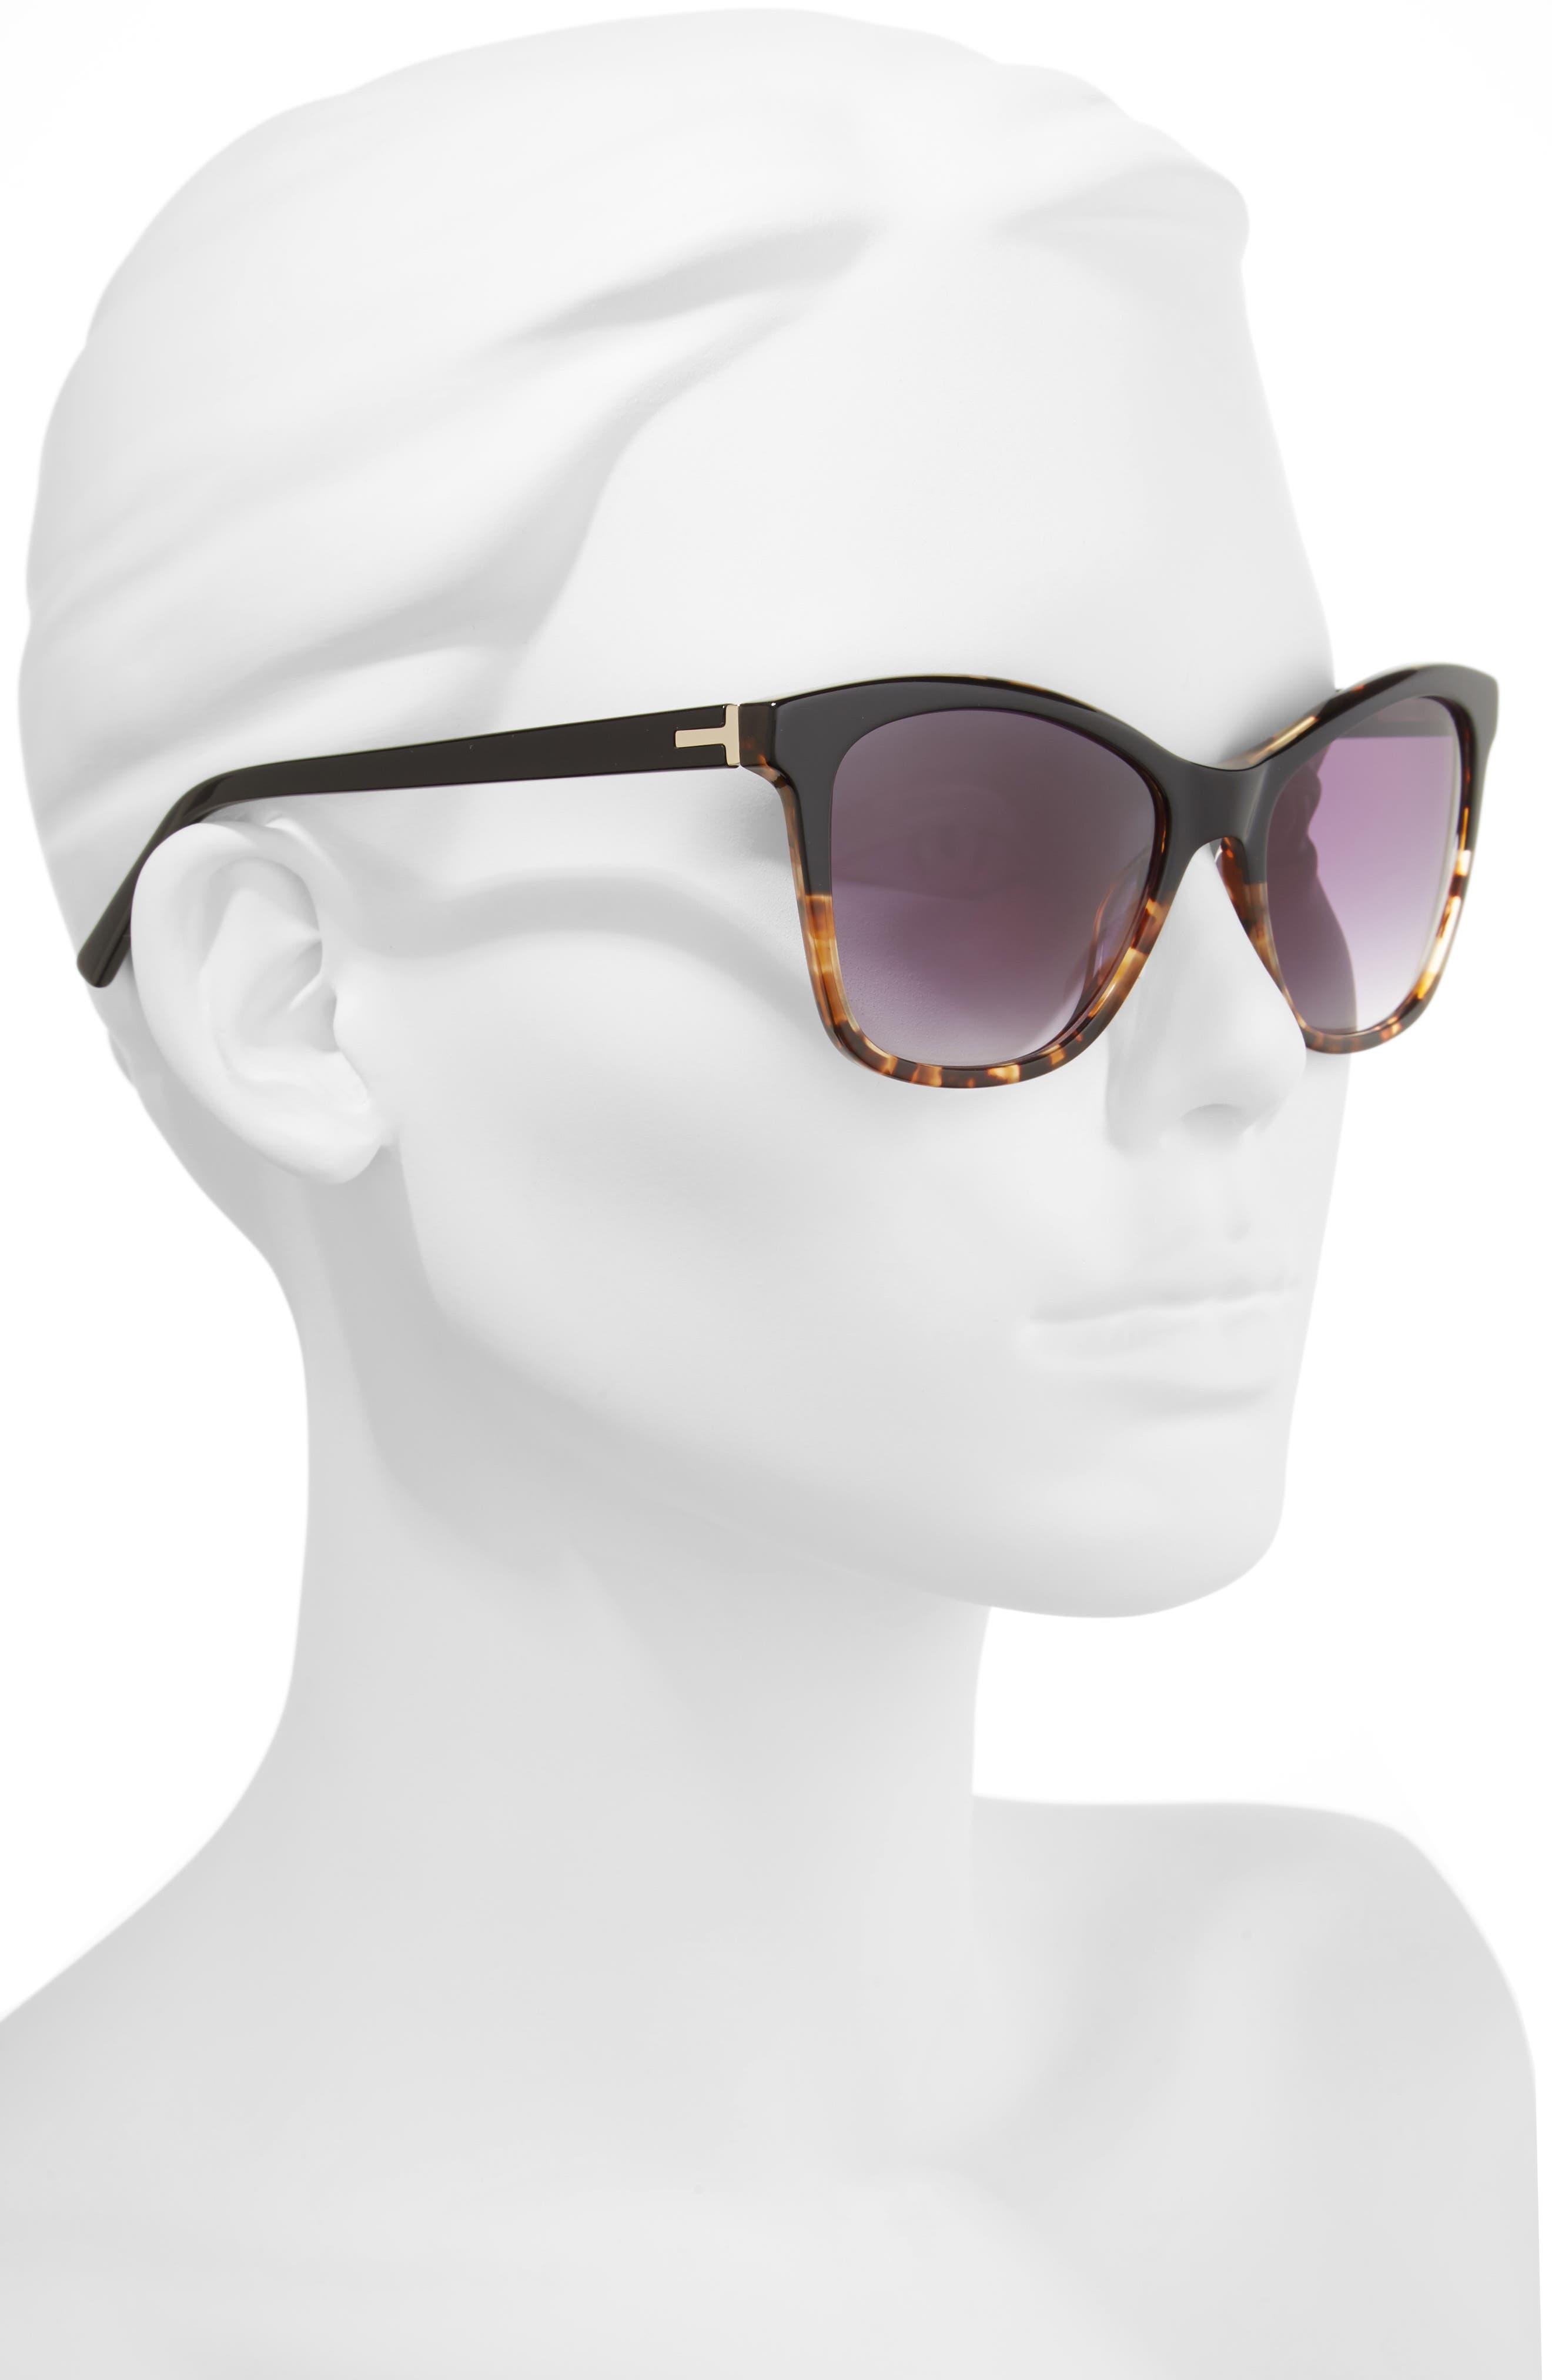 55mm Cat Eye Sunglasses,                             Alternate thumbnail 3, color,